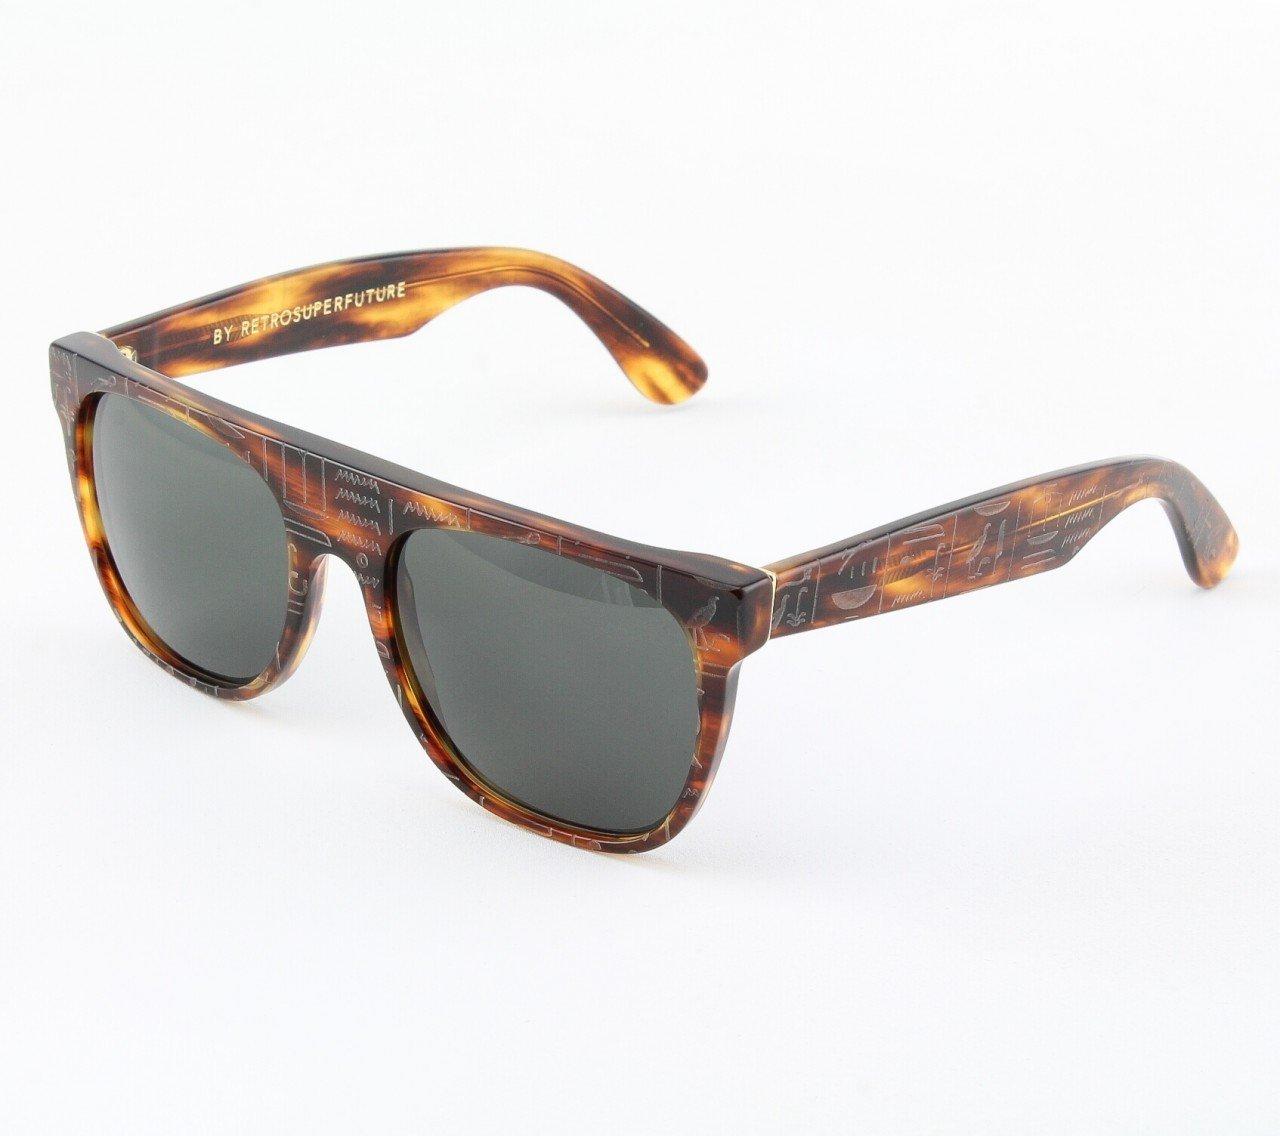 Super Flat Top 860/3T Sunglasses Havana with Black Zeiss Lenses by RETROSUPERFUTURE